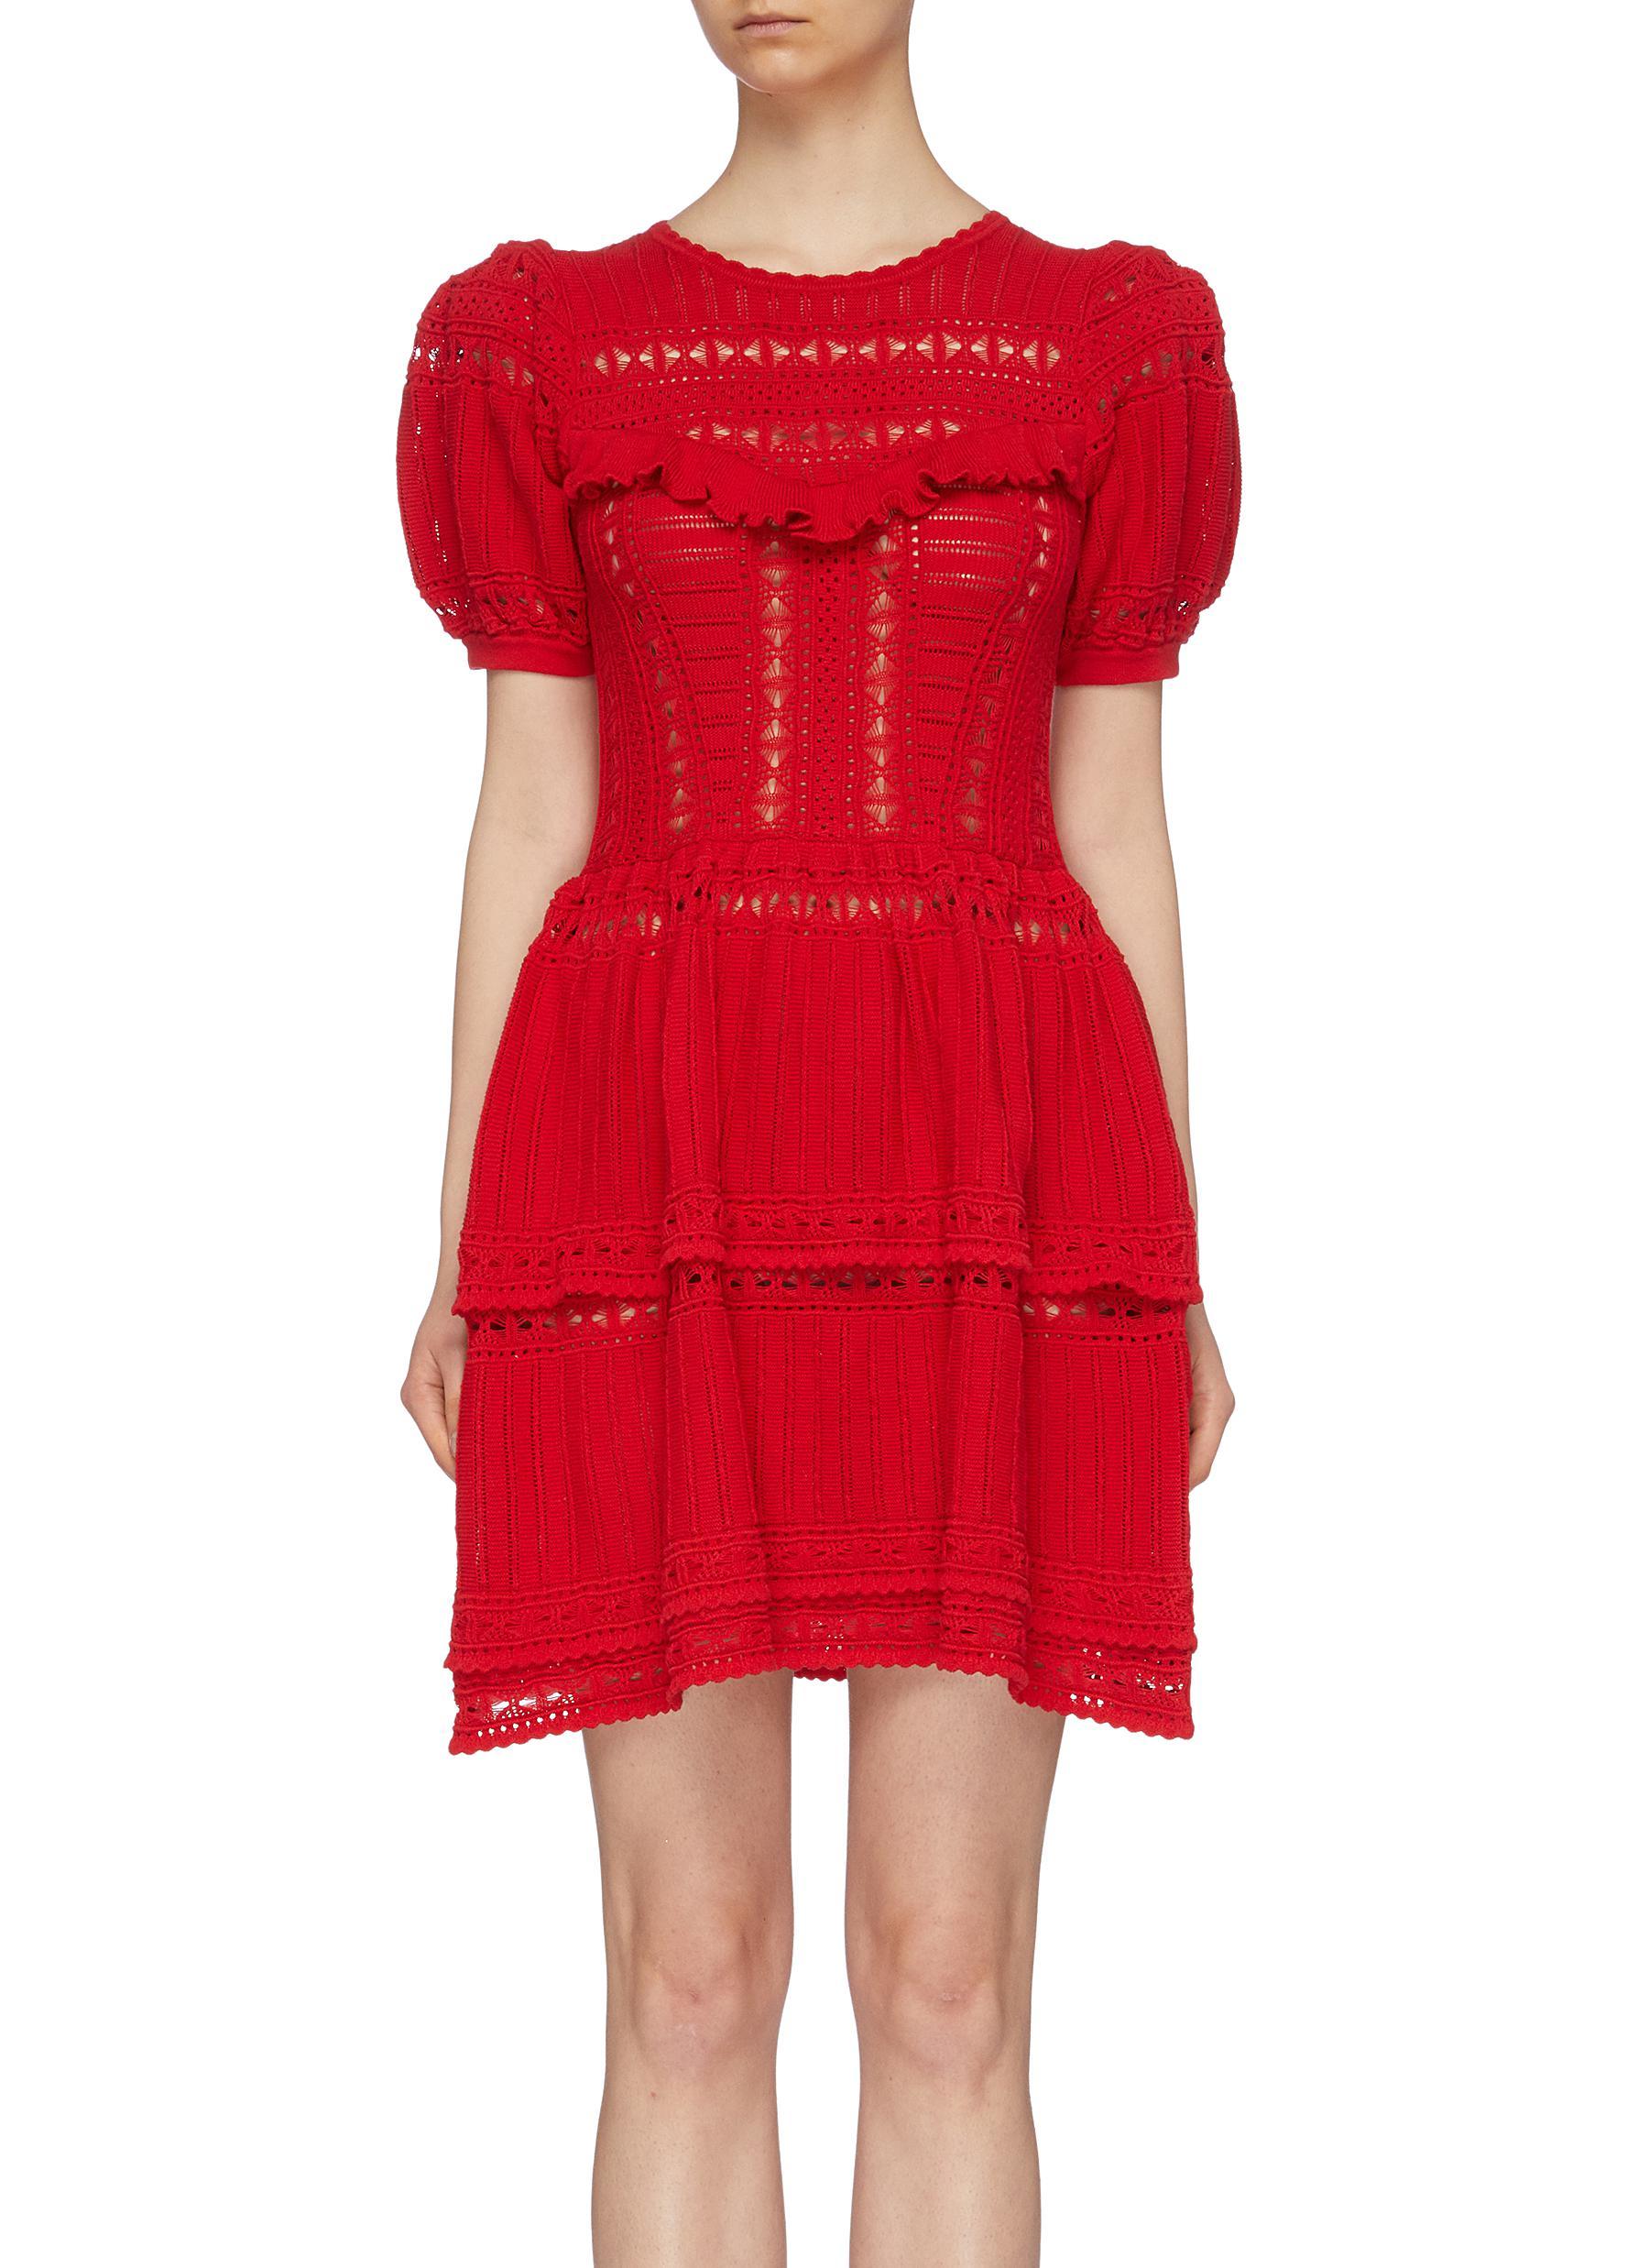 Puff sleeve ruffle yoke tiered pointelle knit mini dress by Self-Portrait